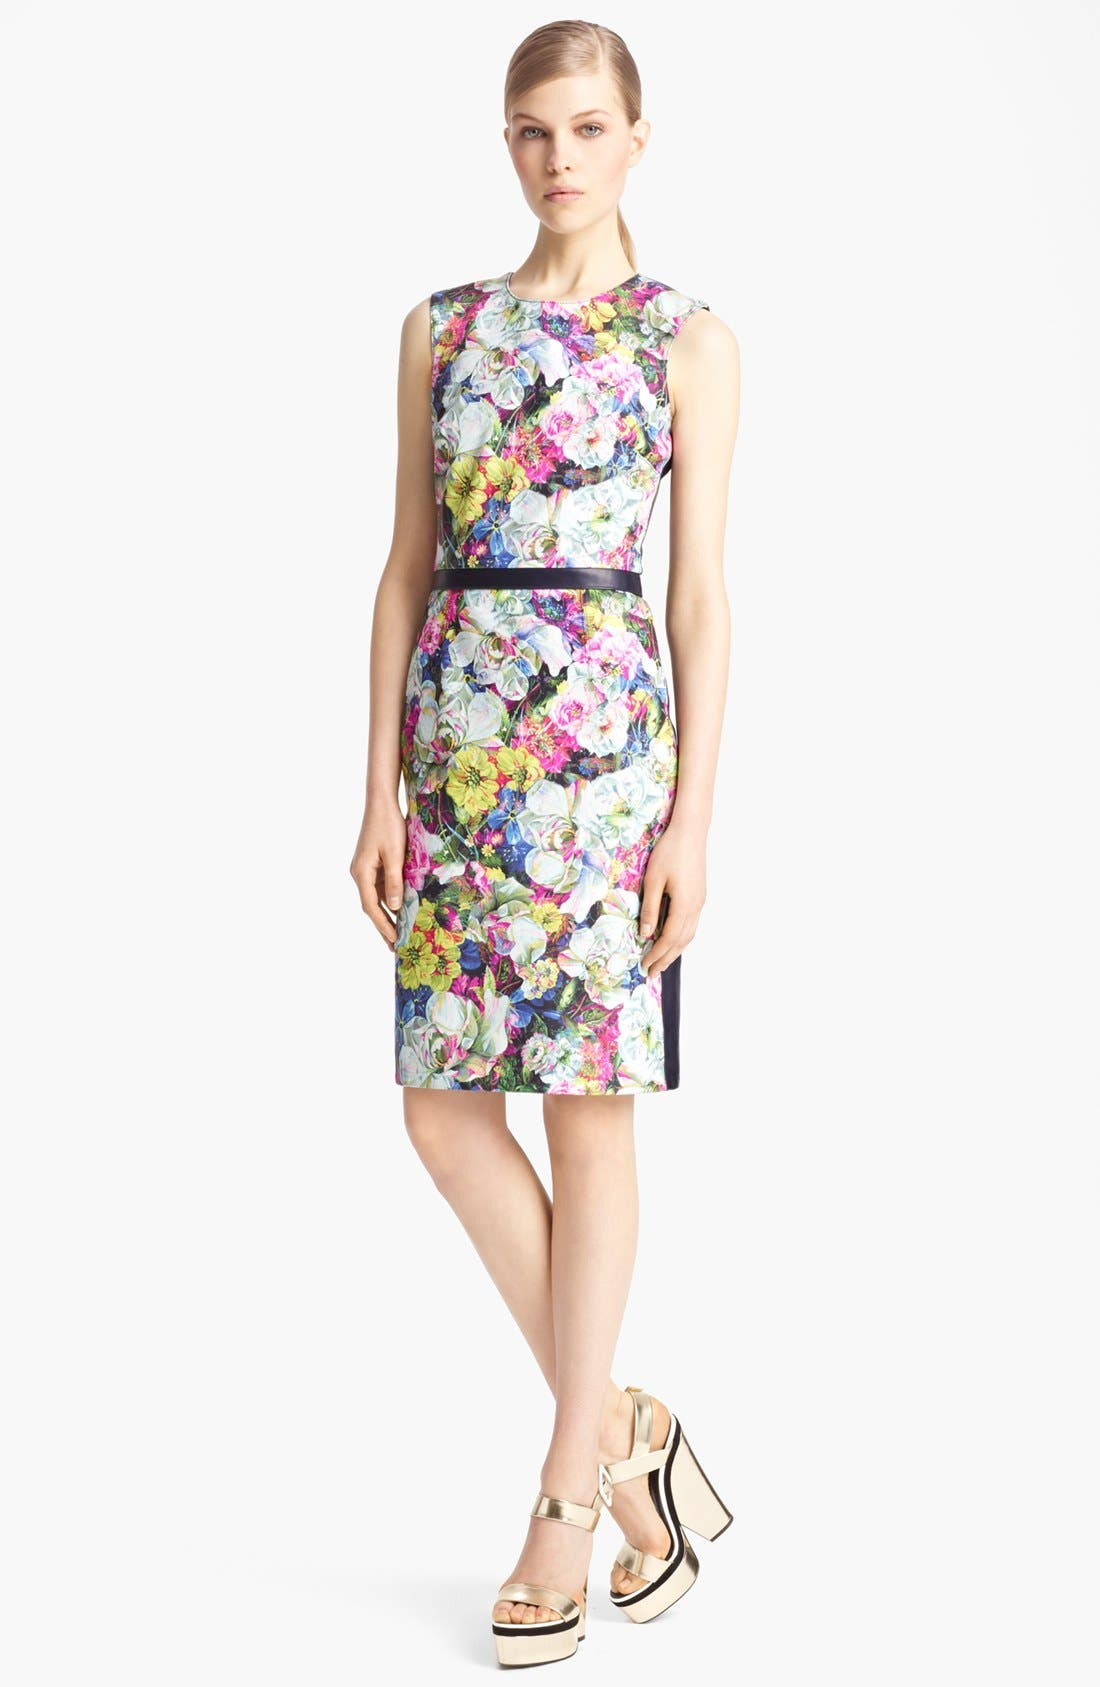 Alternate Image 1 Selected - Erdem St. Germain Rose Print Leather Dress